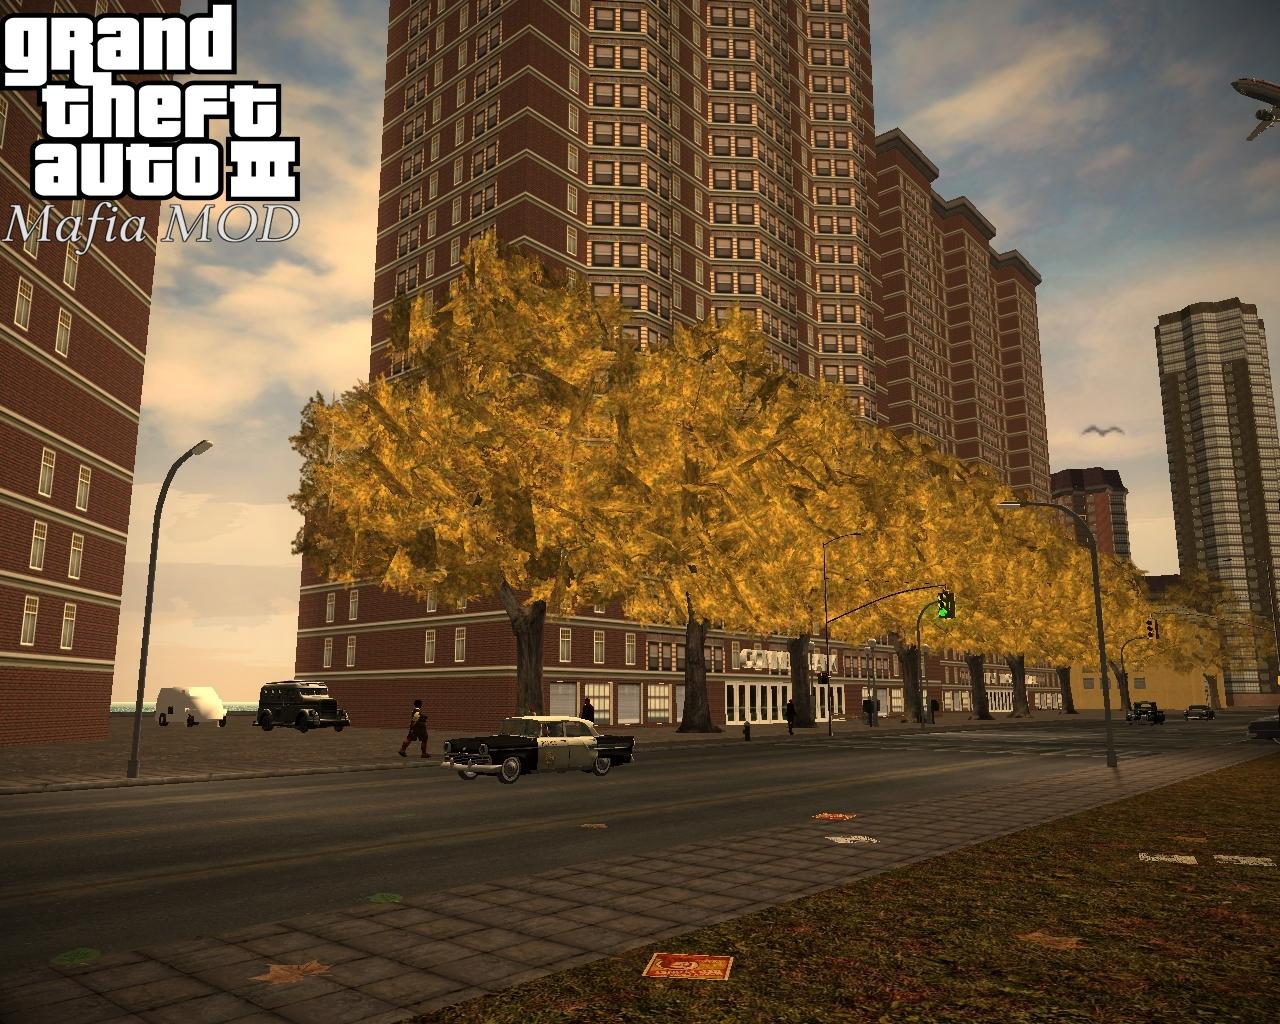 PRESENTATION3.jpg - Grand Theft Auto 3